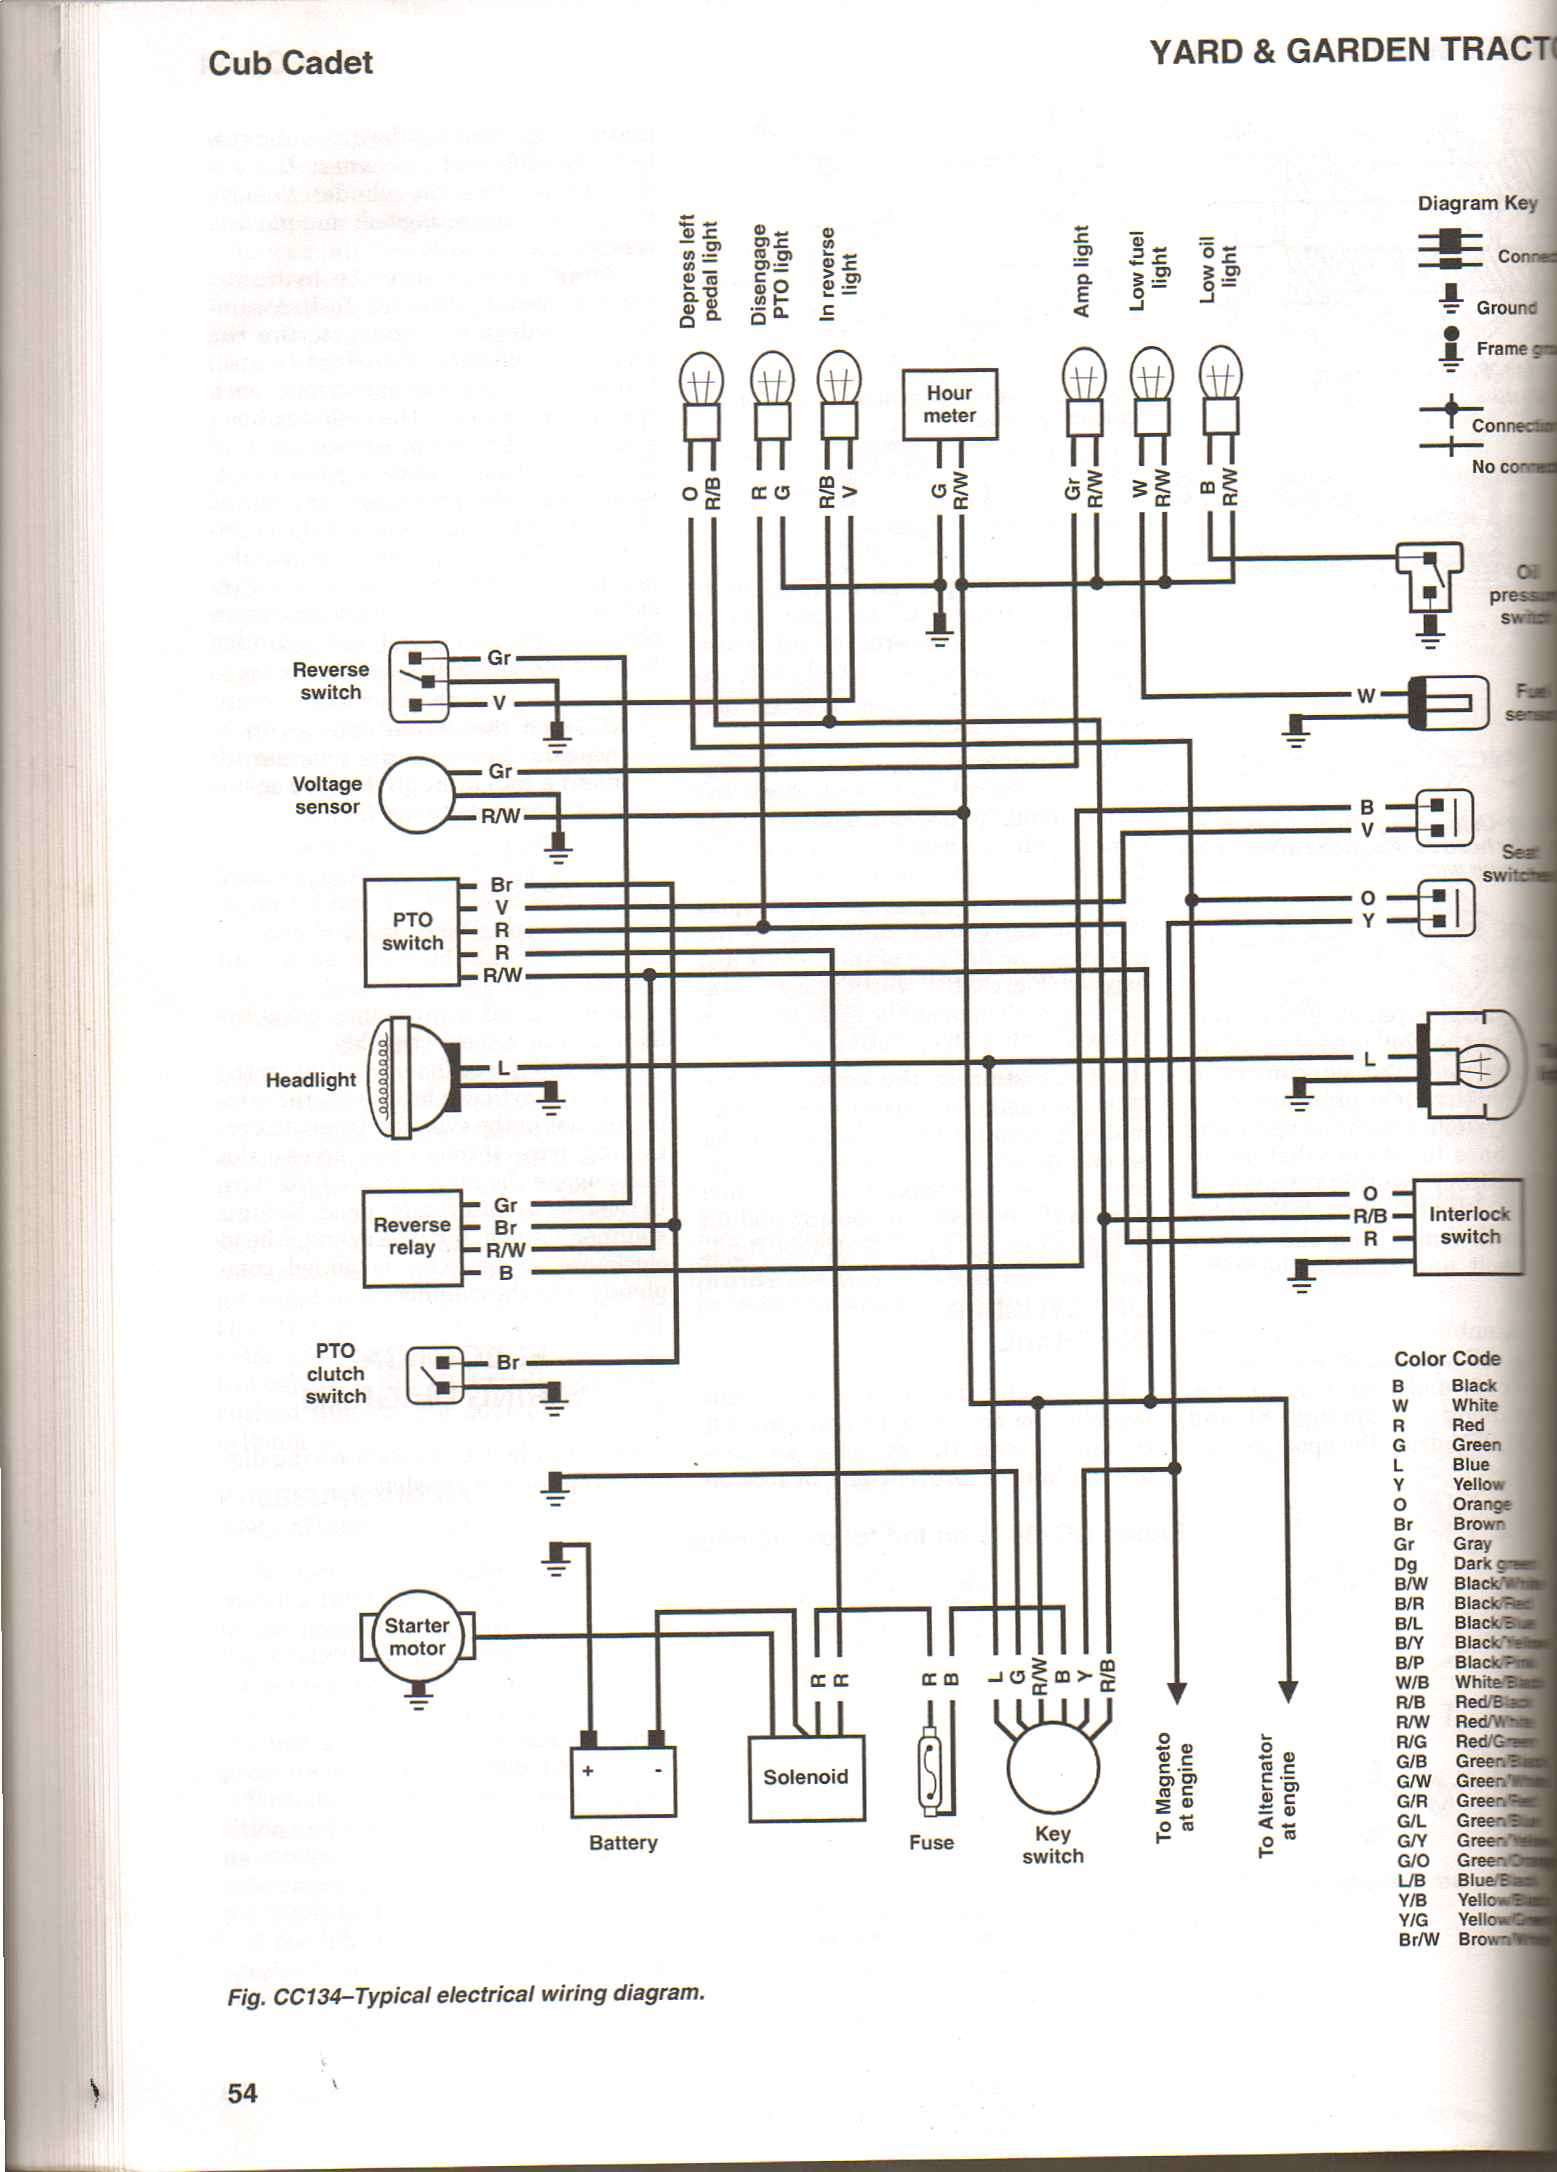 Wiring Diagram For Cub Cadet Zero Turn - Wiring Diagrams Hubs - Cub Cadet Rzt 50 Wiring Diagram